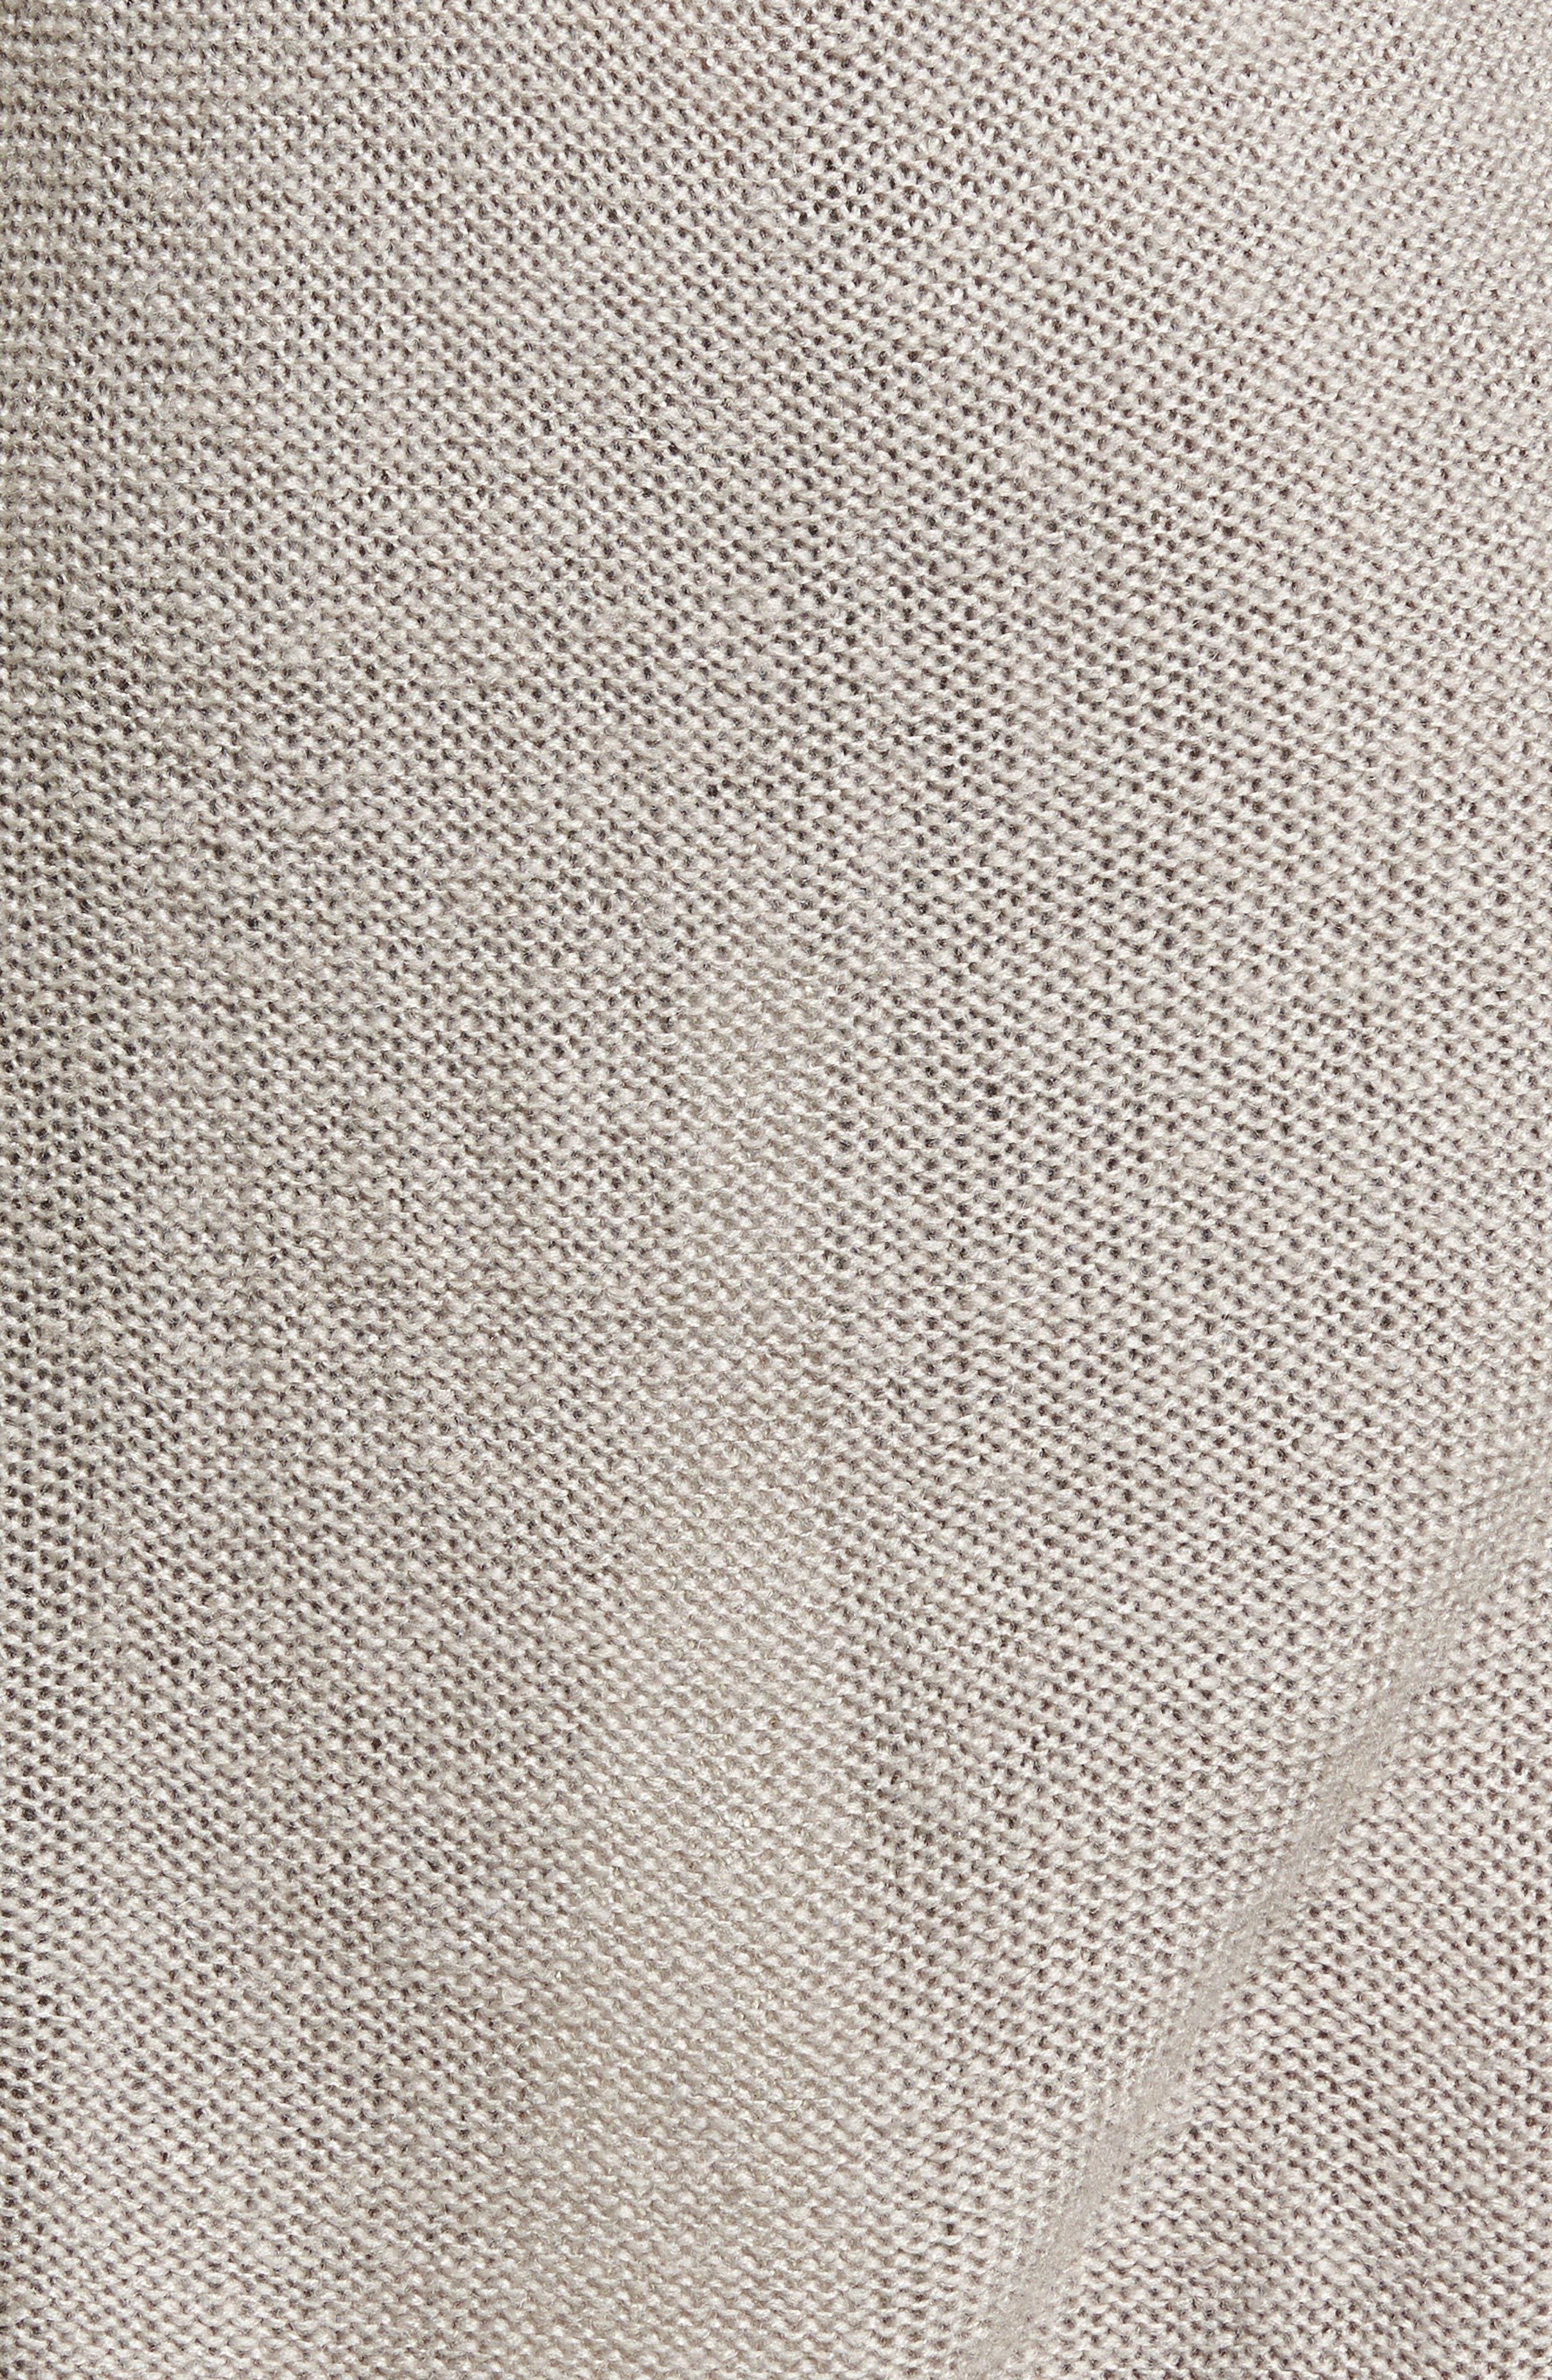 Bell Sleeve Sweater Dress,                             Alternate thumbnail 5, color,                             Light Heather Grey